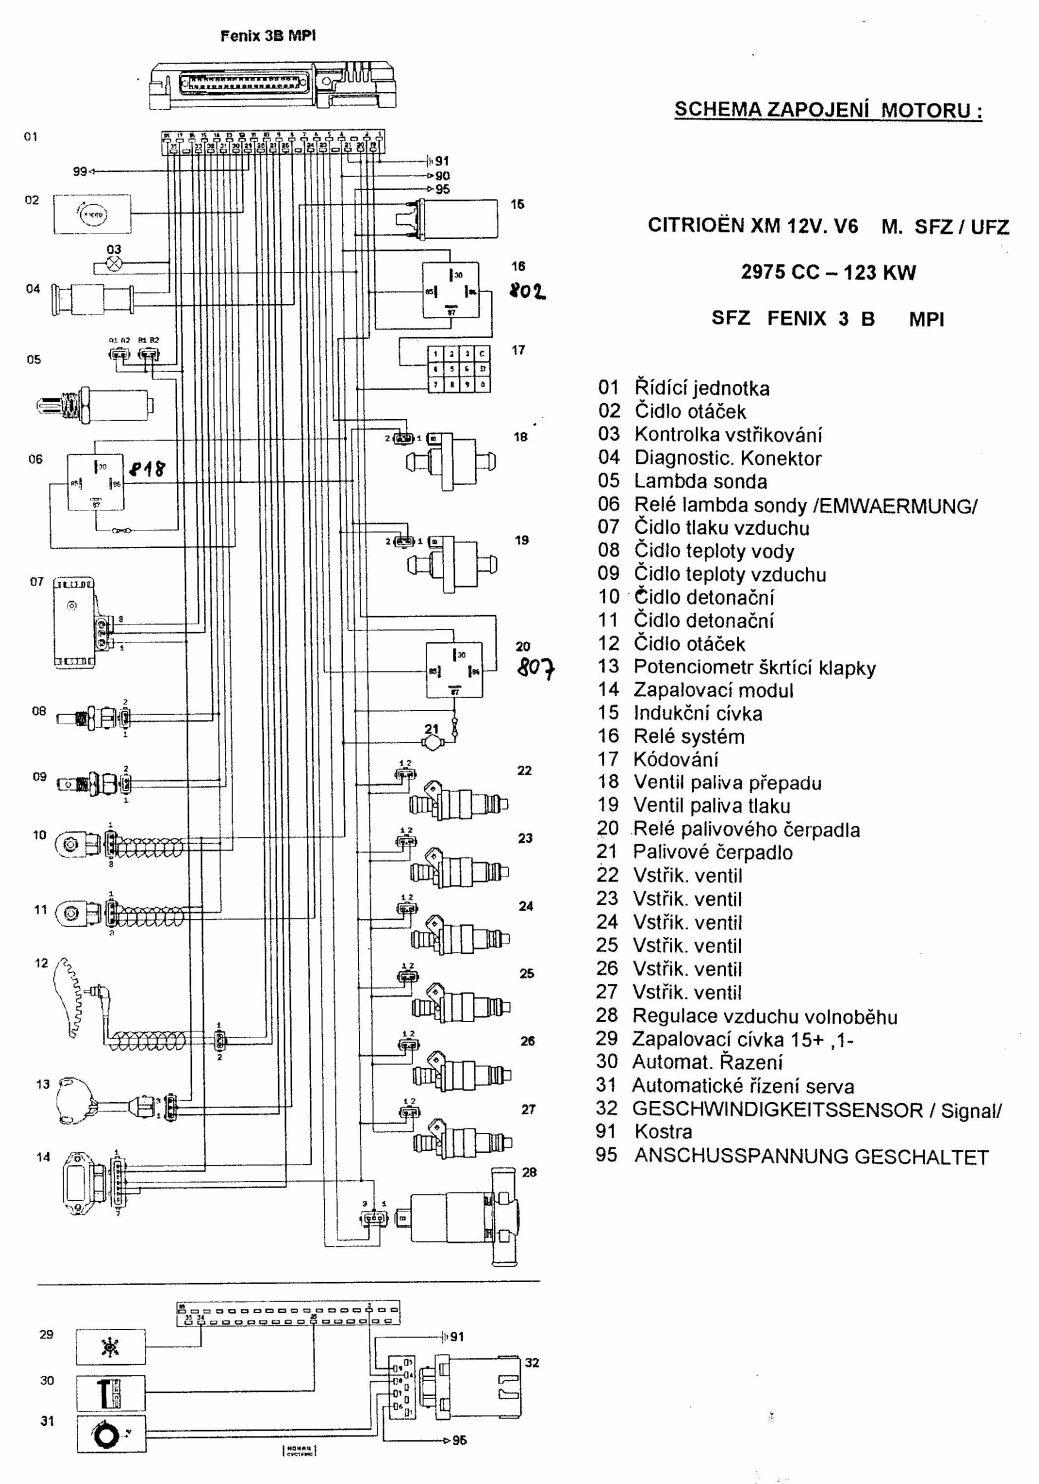 Анатолий донецк написал(а). Может у кого то завалялась подробная схема на проводку движка.  0. Вот завалялась такая...